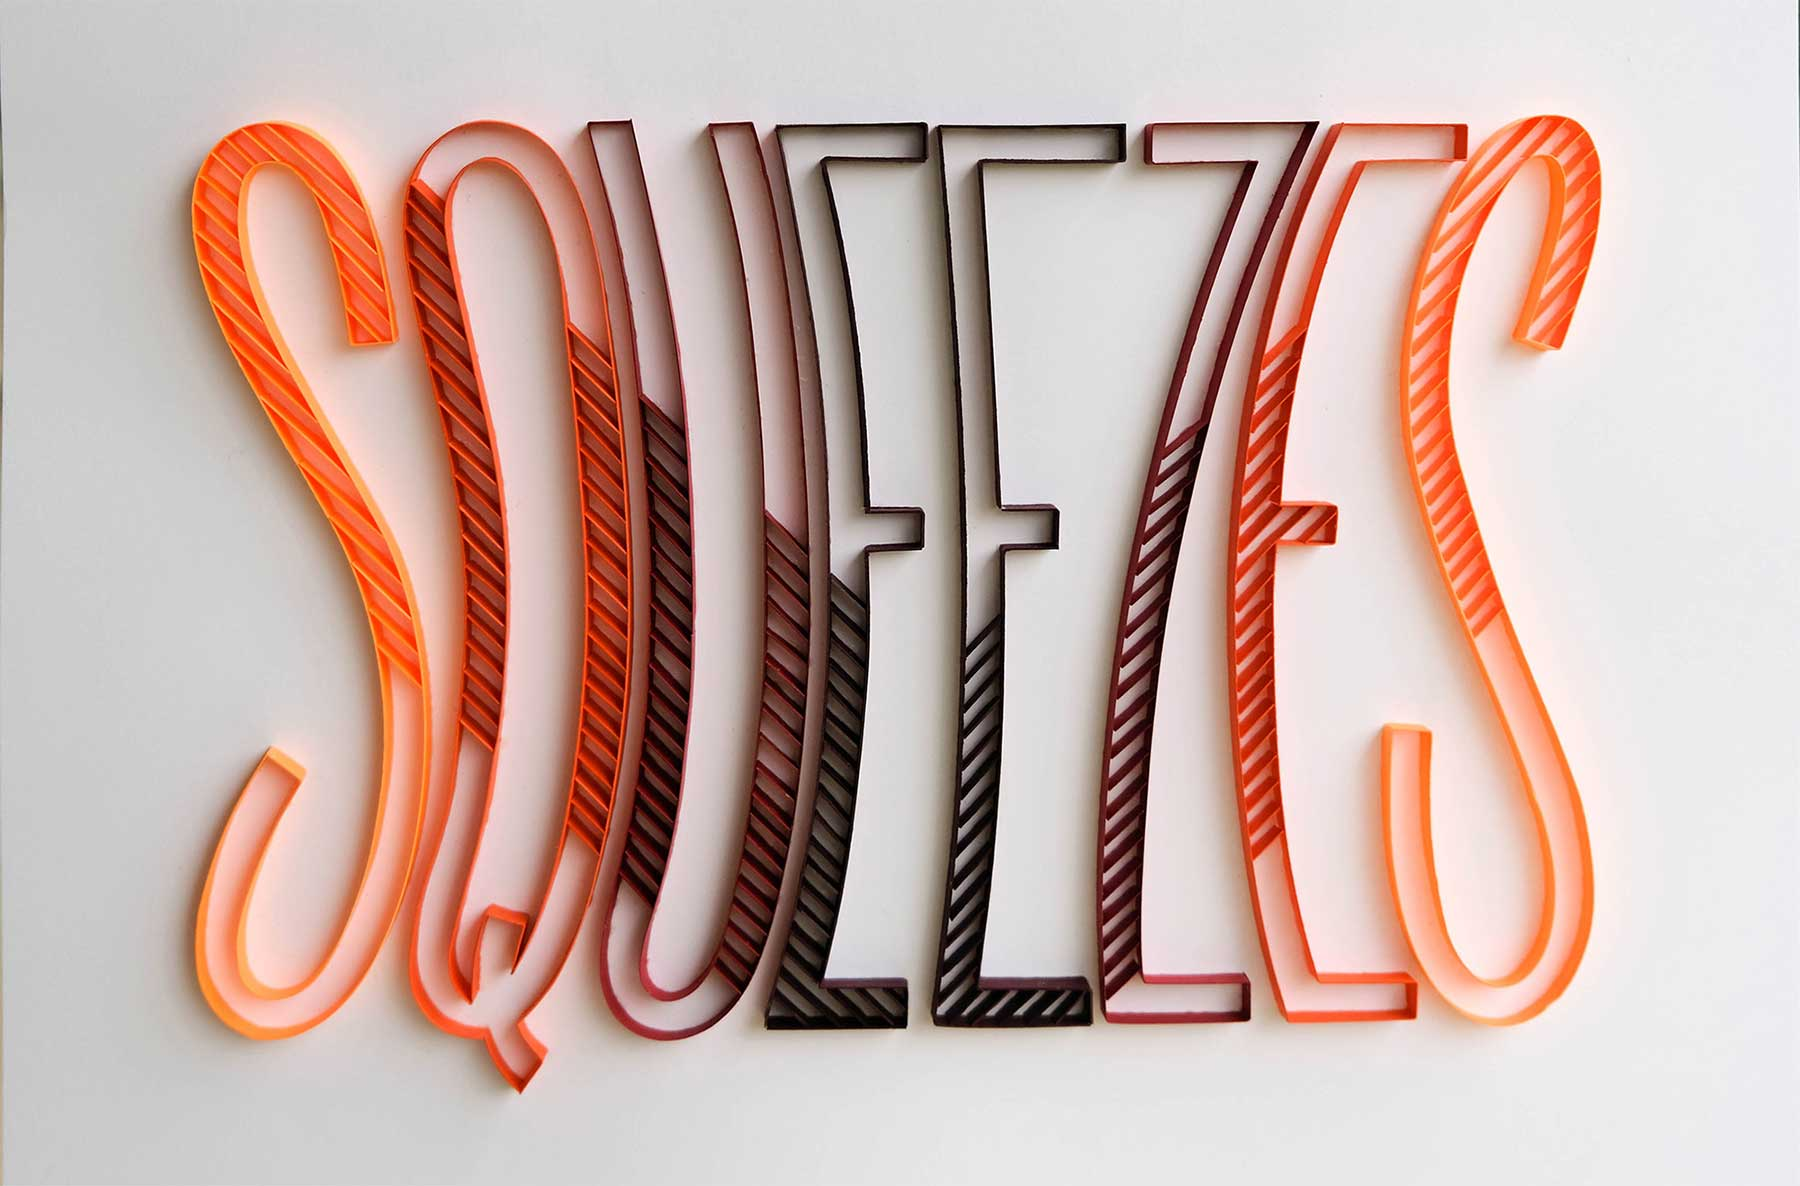 3D-Papier-Lettering von Alia Bright Alia-Bright-paperlettering_13